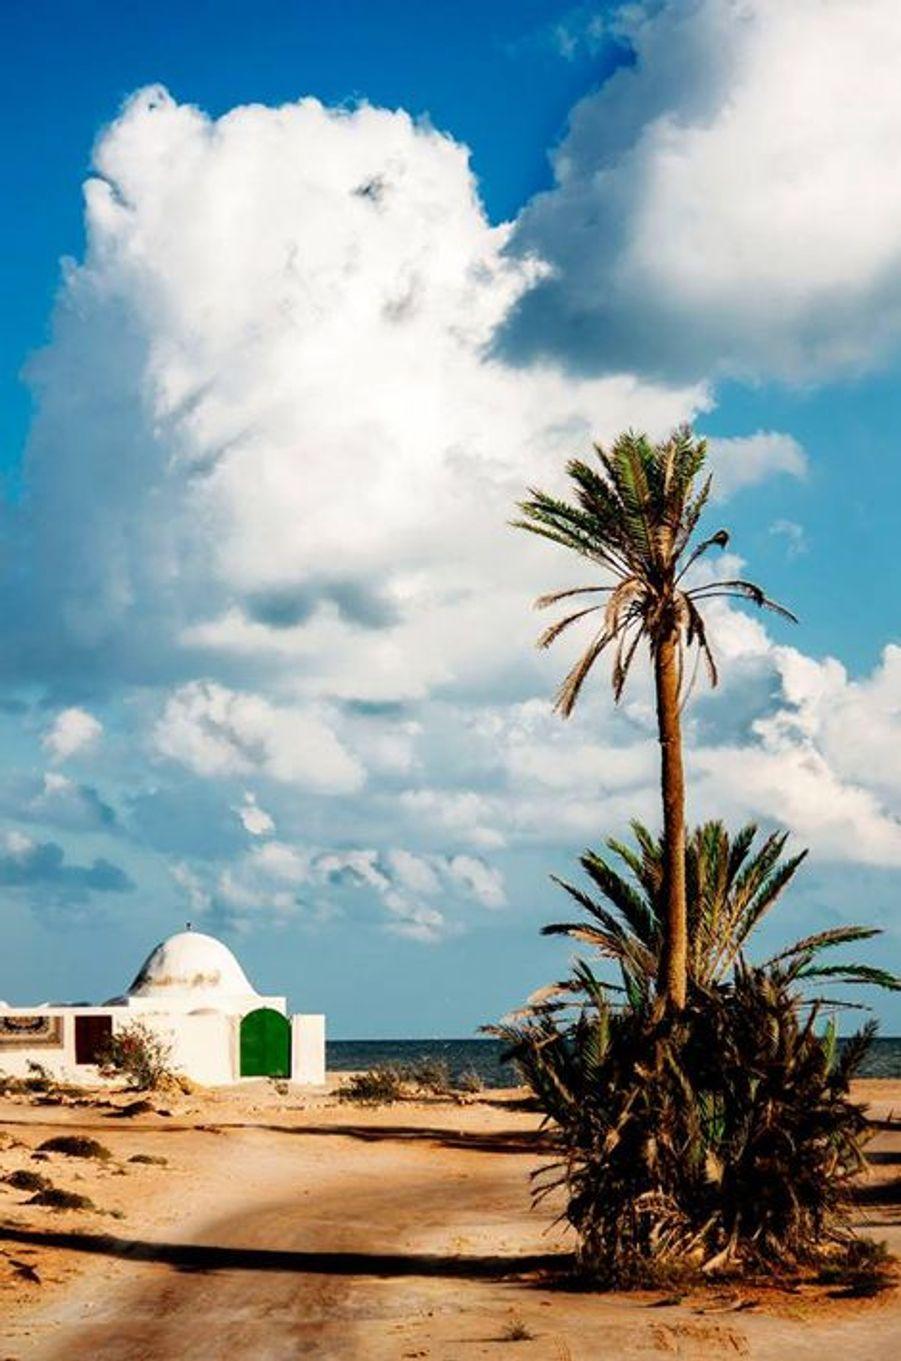 """Meditation au bord de la mer"" Djerba (Tunisie) le 1er novembre 2014"